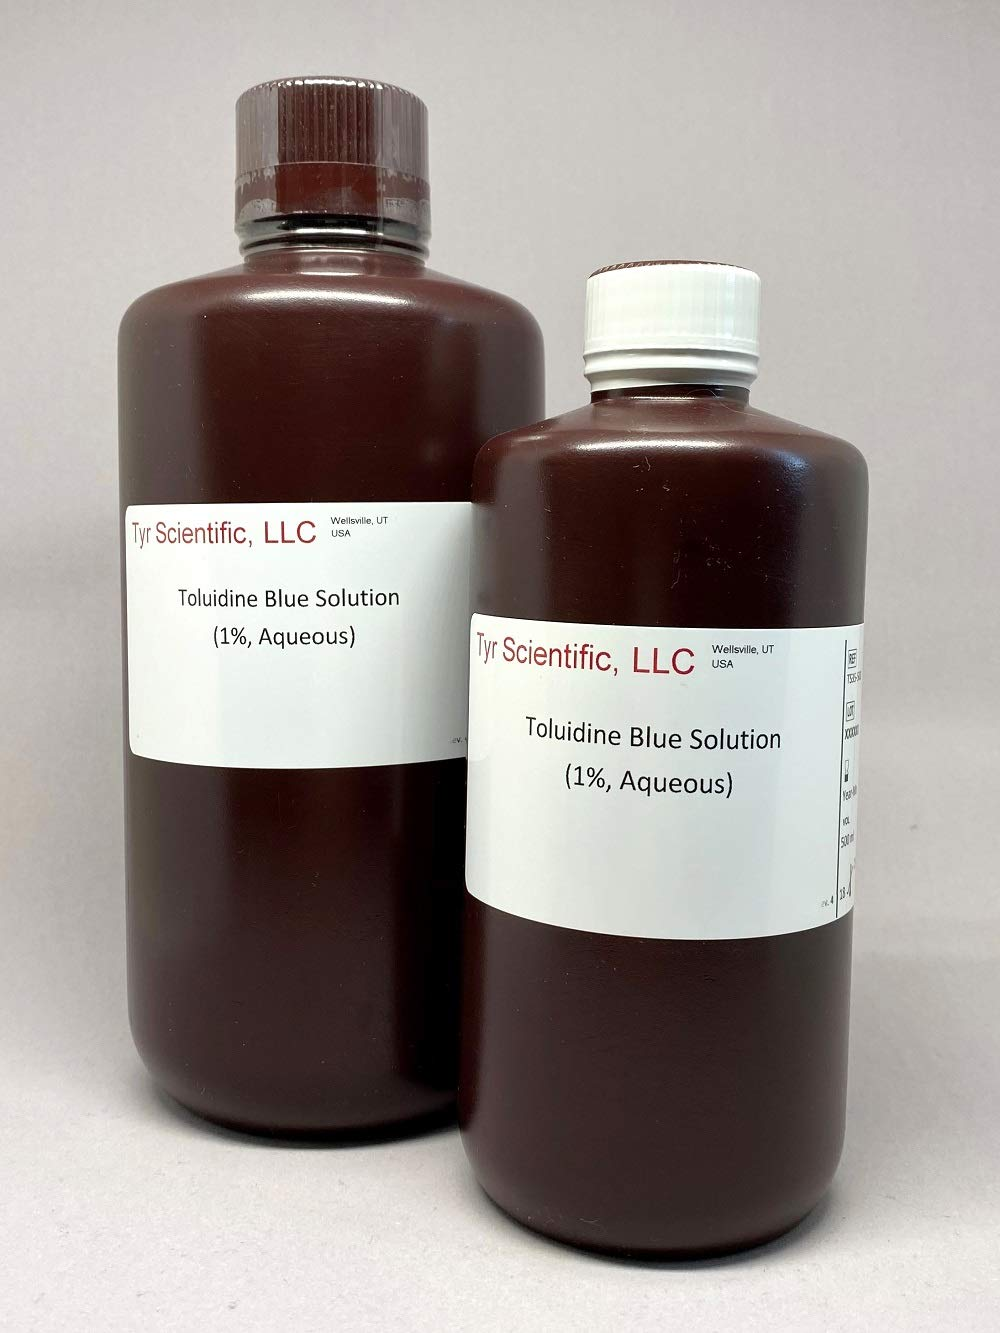 1/%, Aqueous 500ml Toluidine Blue Solution